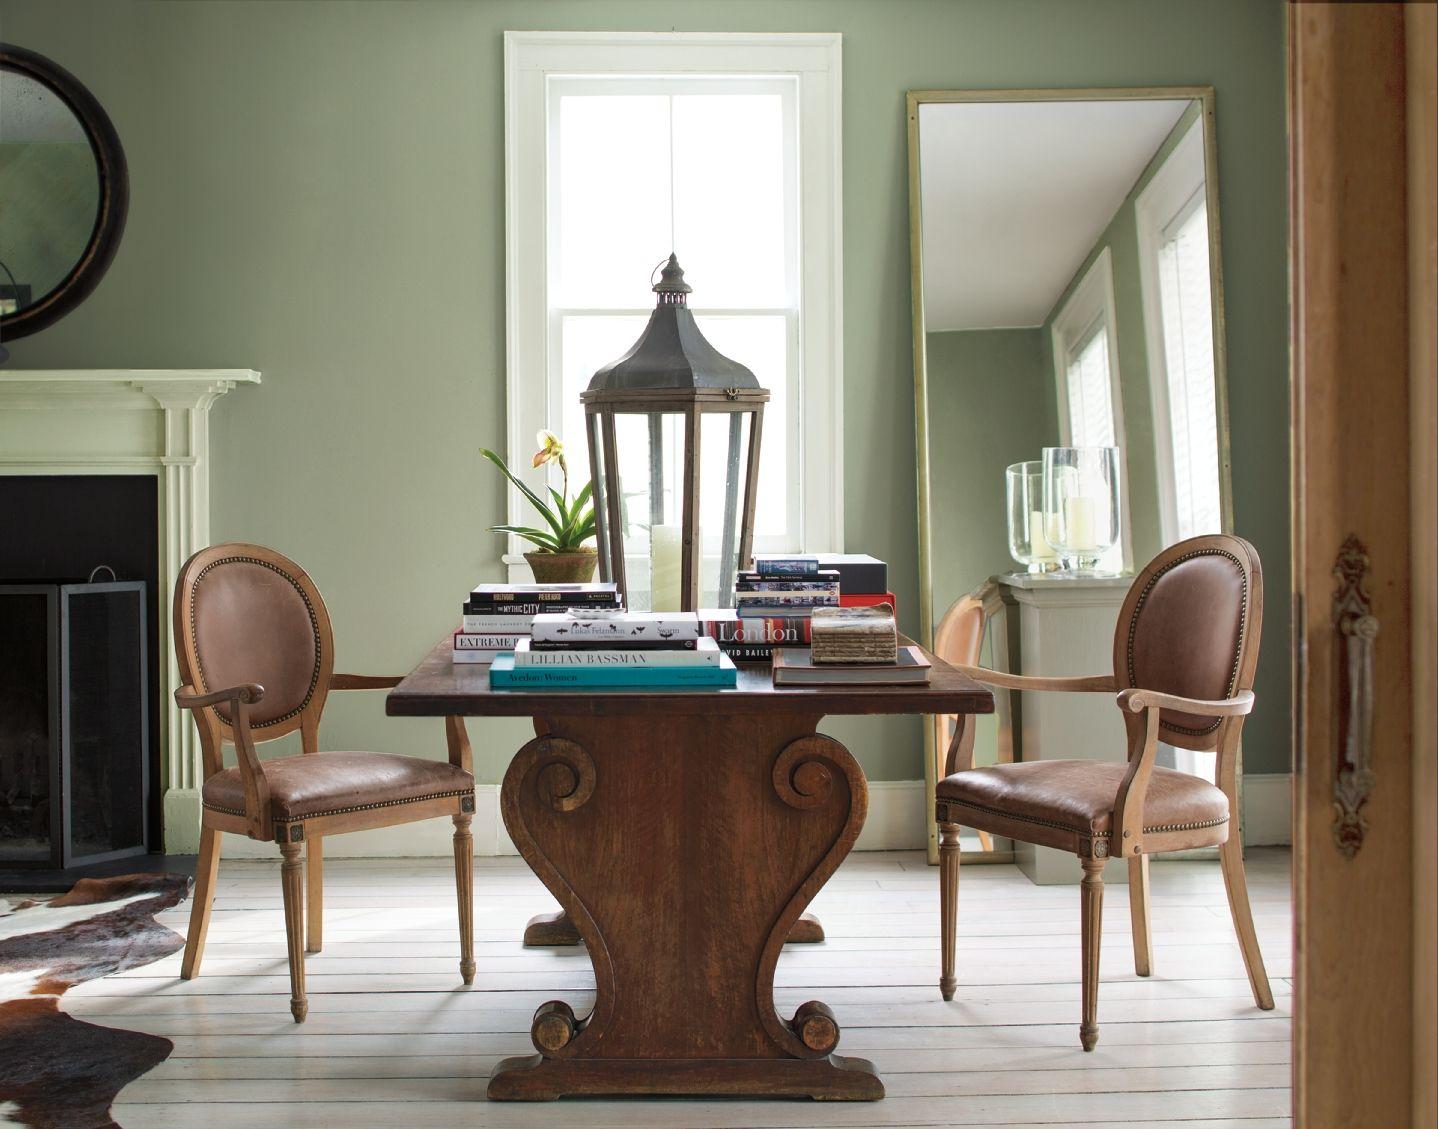 Green Paint Ideas Benjamin Moore Best Bathroom Paint Colors Green Paint Colors Most Popular Paint Colors